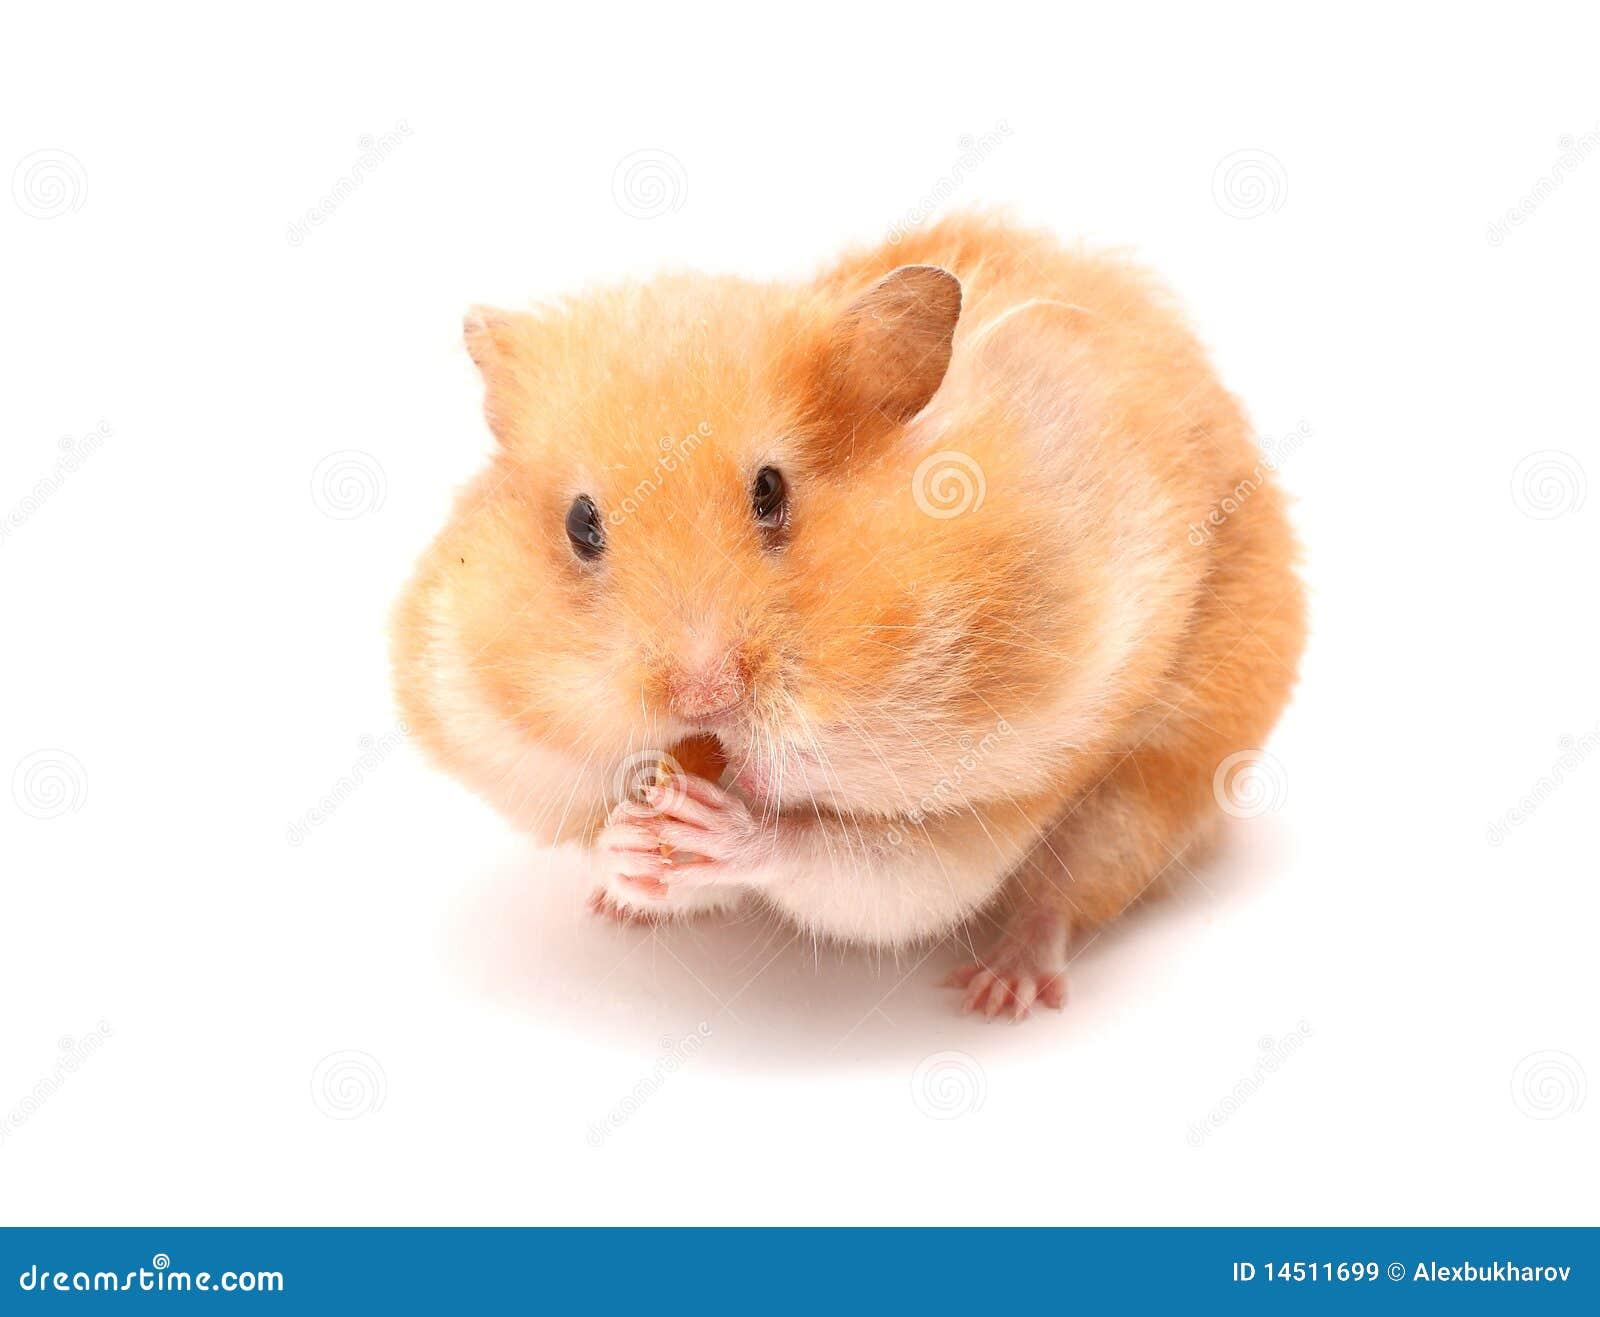 Hamster free videos